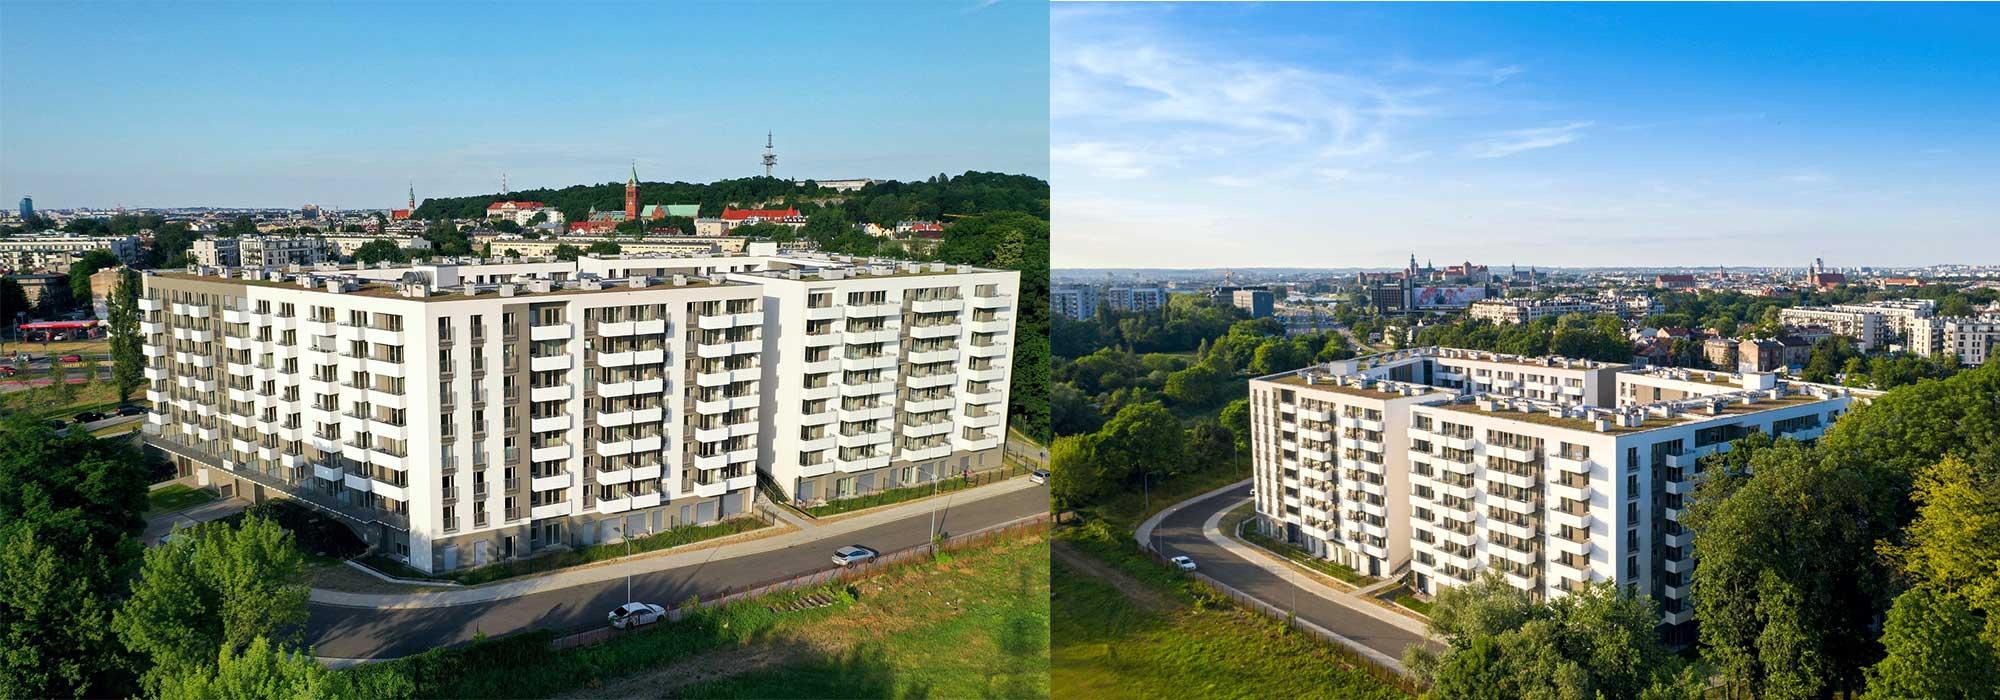 Konopnicka City Park-Krakow